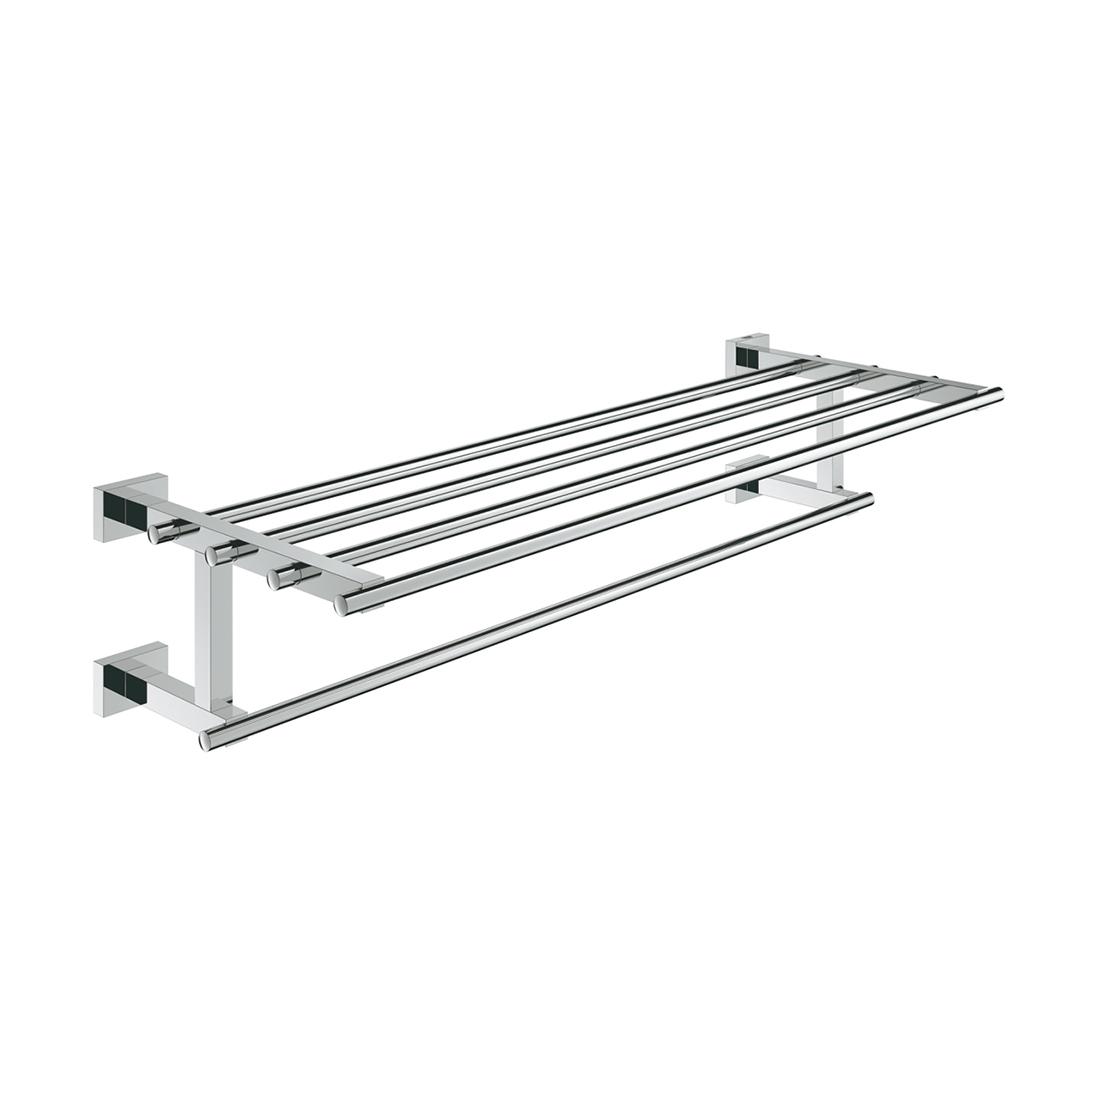 Grohe 40512001 Essentials Cube Multi-Towel Rack